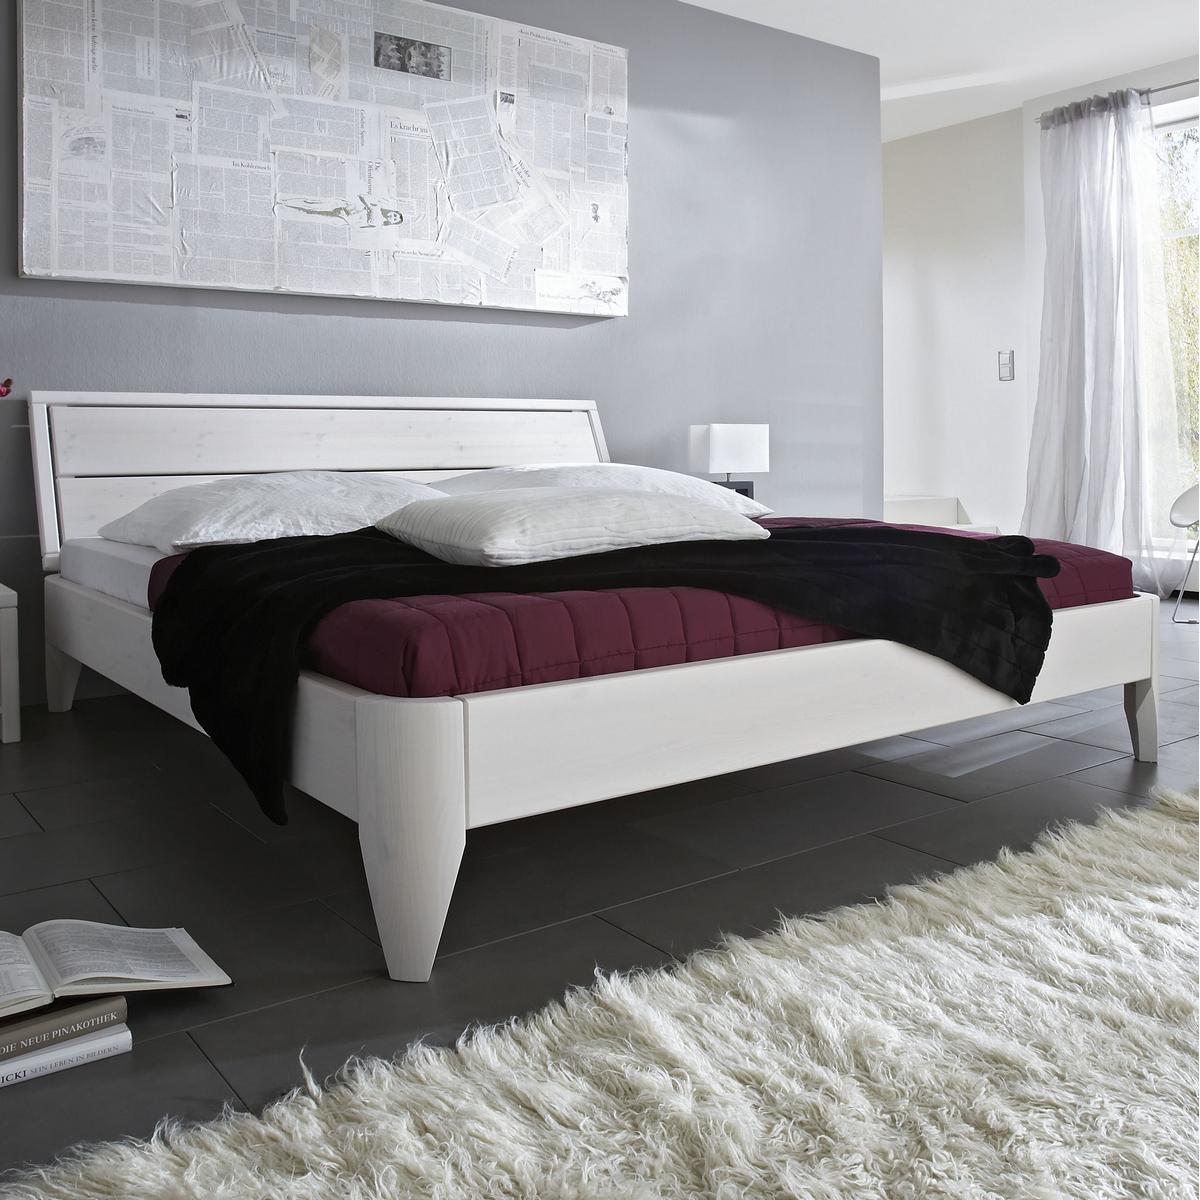 Holzbett weiß  Massivholz Bett 120x200 EASY SLEEP Kiefer massiv weiß lackiert ...